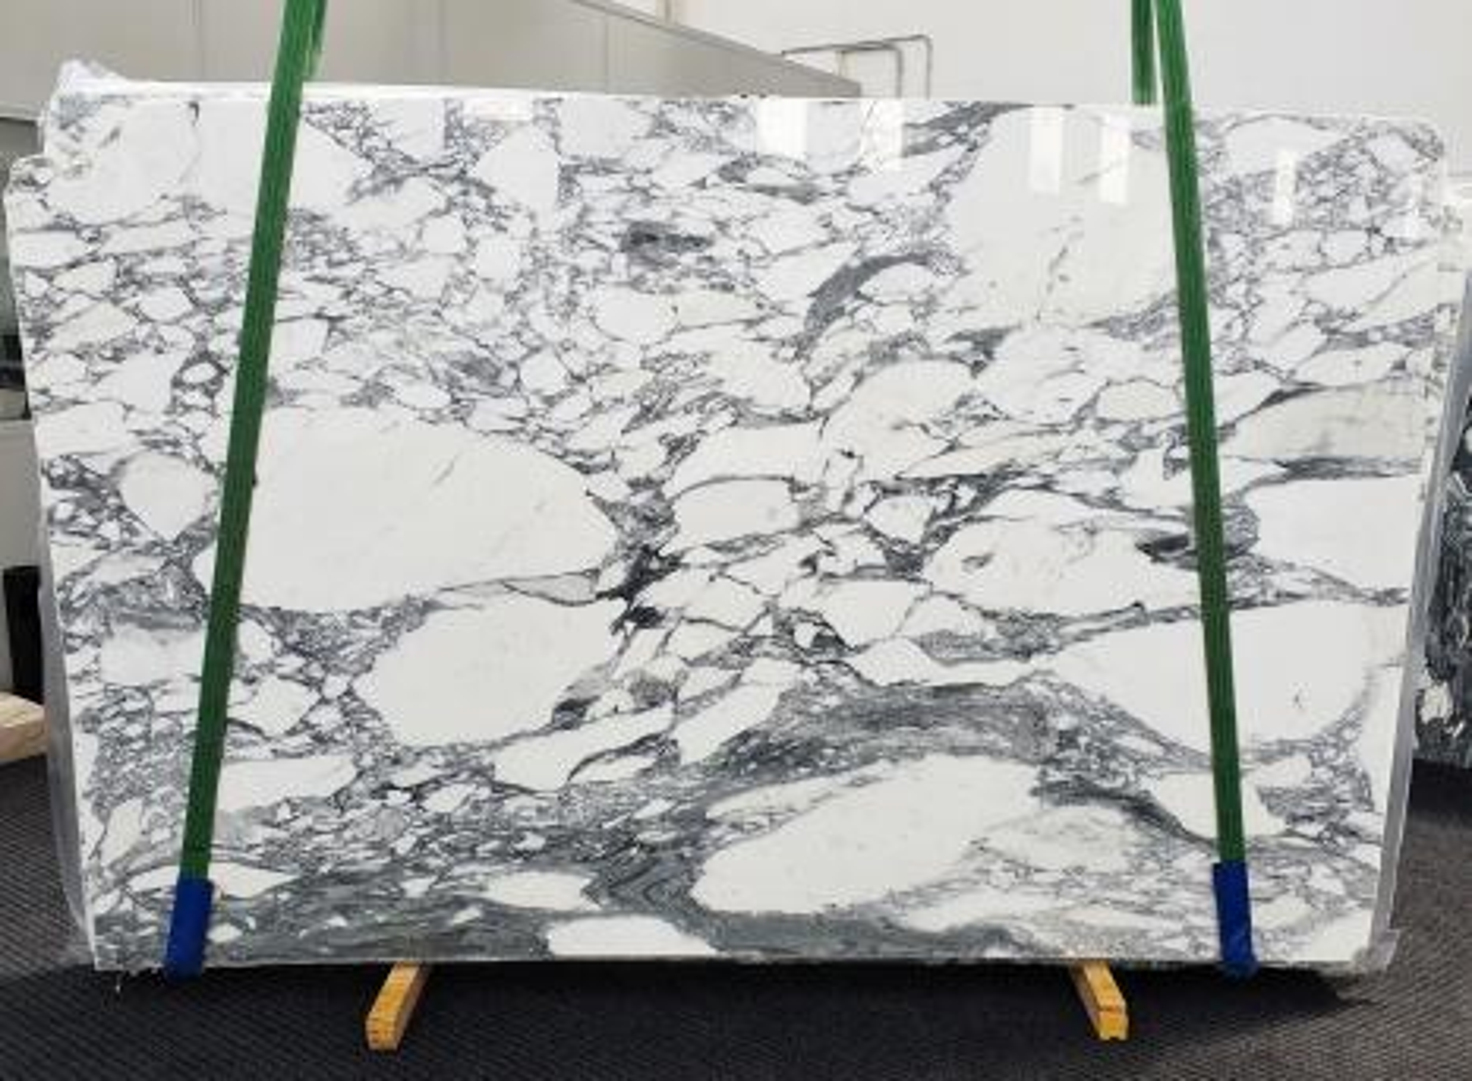 ARABESCATO CORCHIA Supply Veneto (Italy) polished slabs 1433 , Slab #45 natural marble